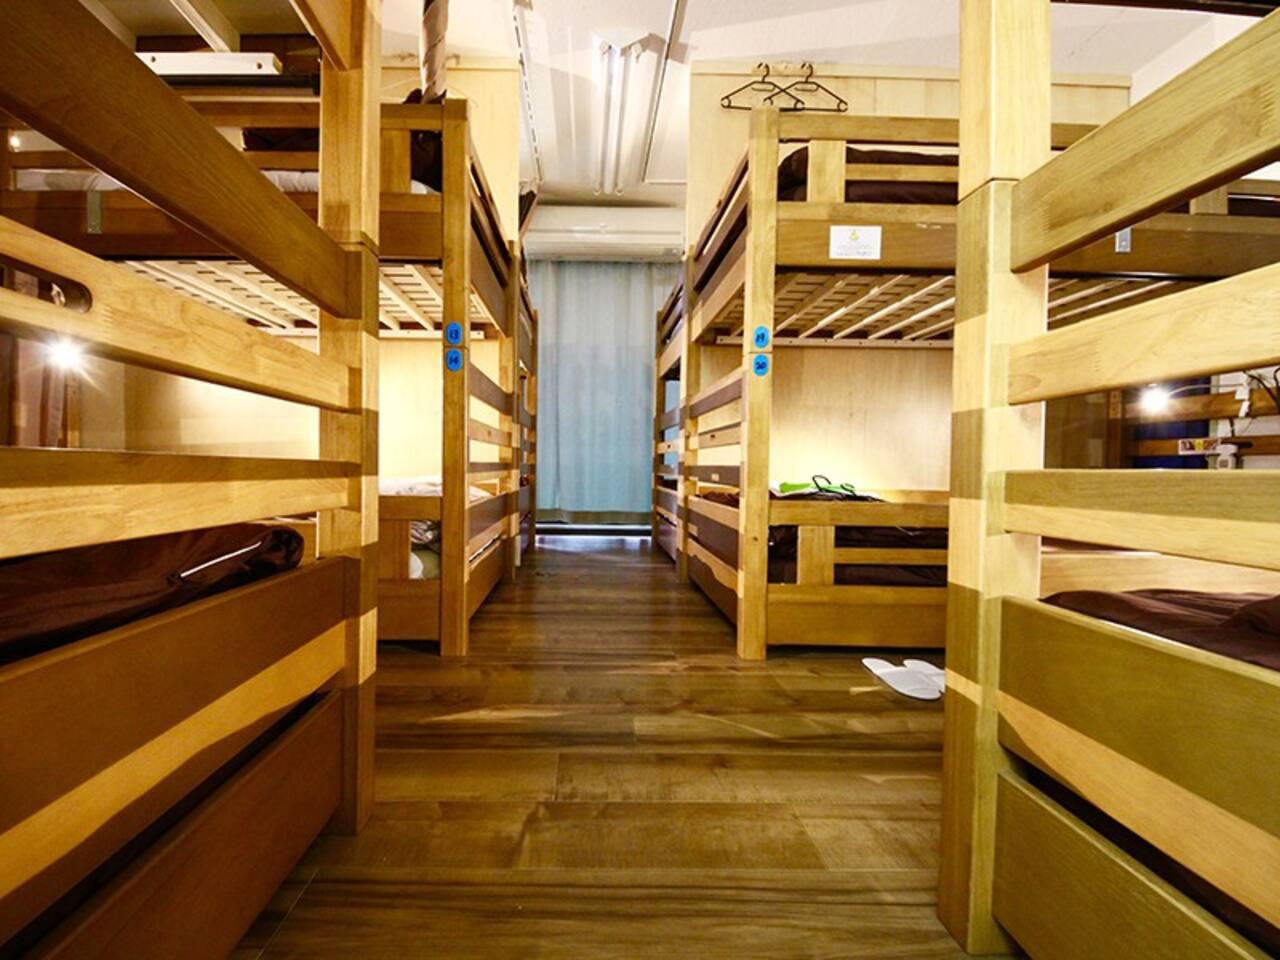 Shared dormitory rooms accommodate 10-12 people in a room.  ドミトリールームは一部屋に10名-12名がお入り頂ける大きいお部屋でごさいます。